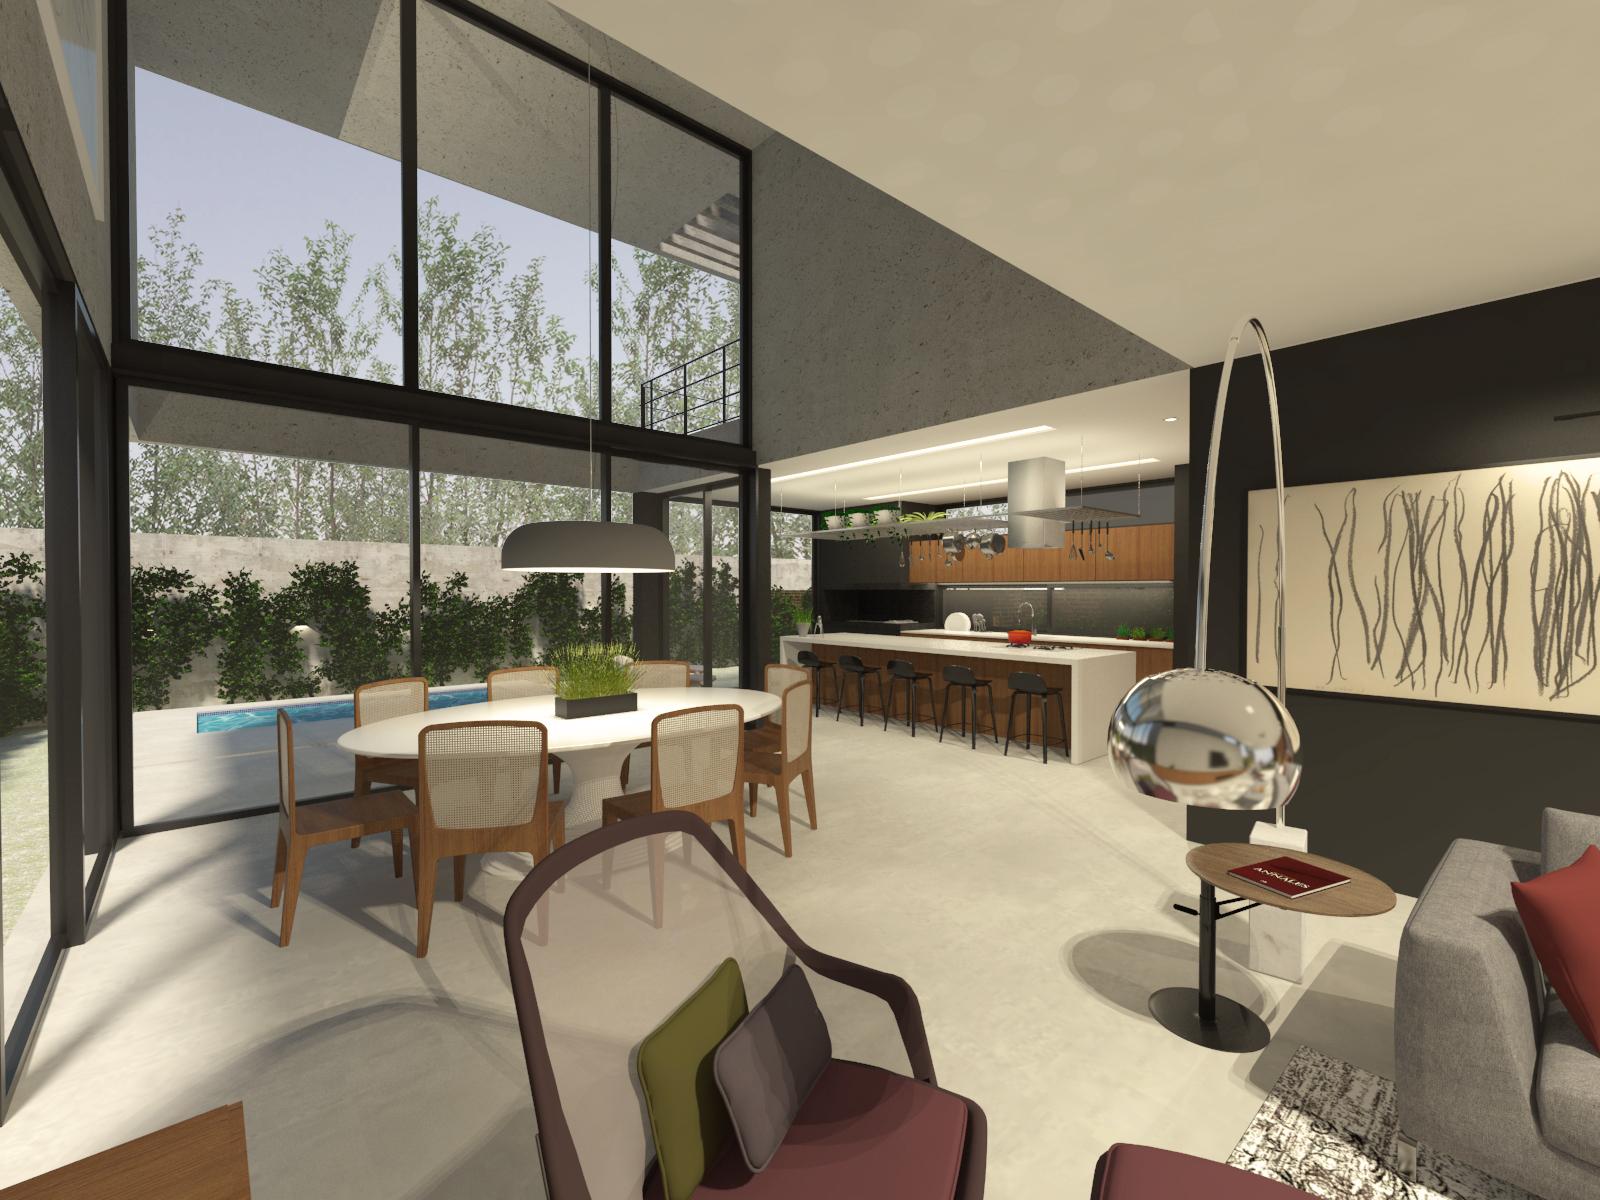 casa coracini | sala de jantar e cozinha